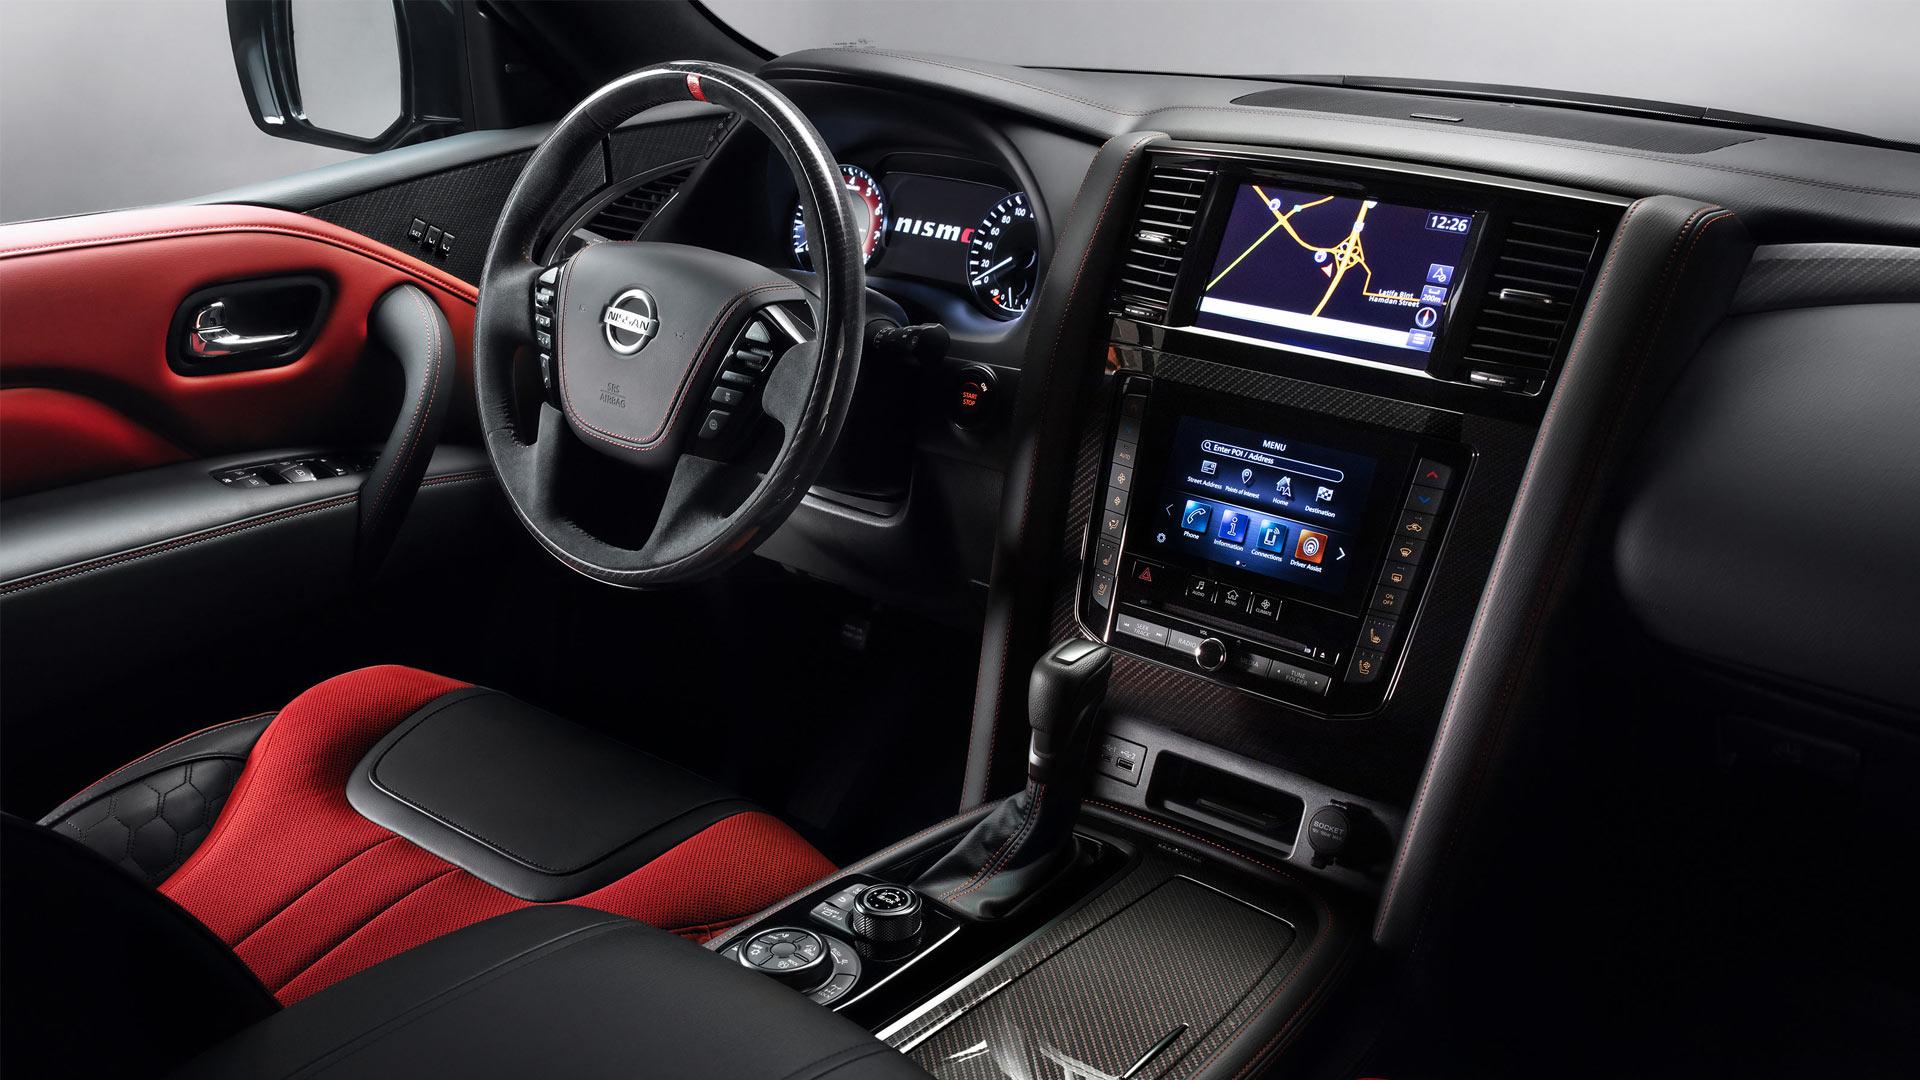 The Nissan Patrol Nismo Dashboard